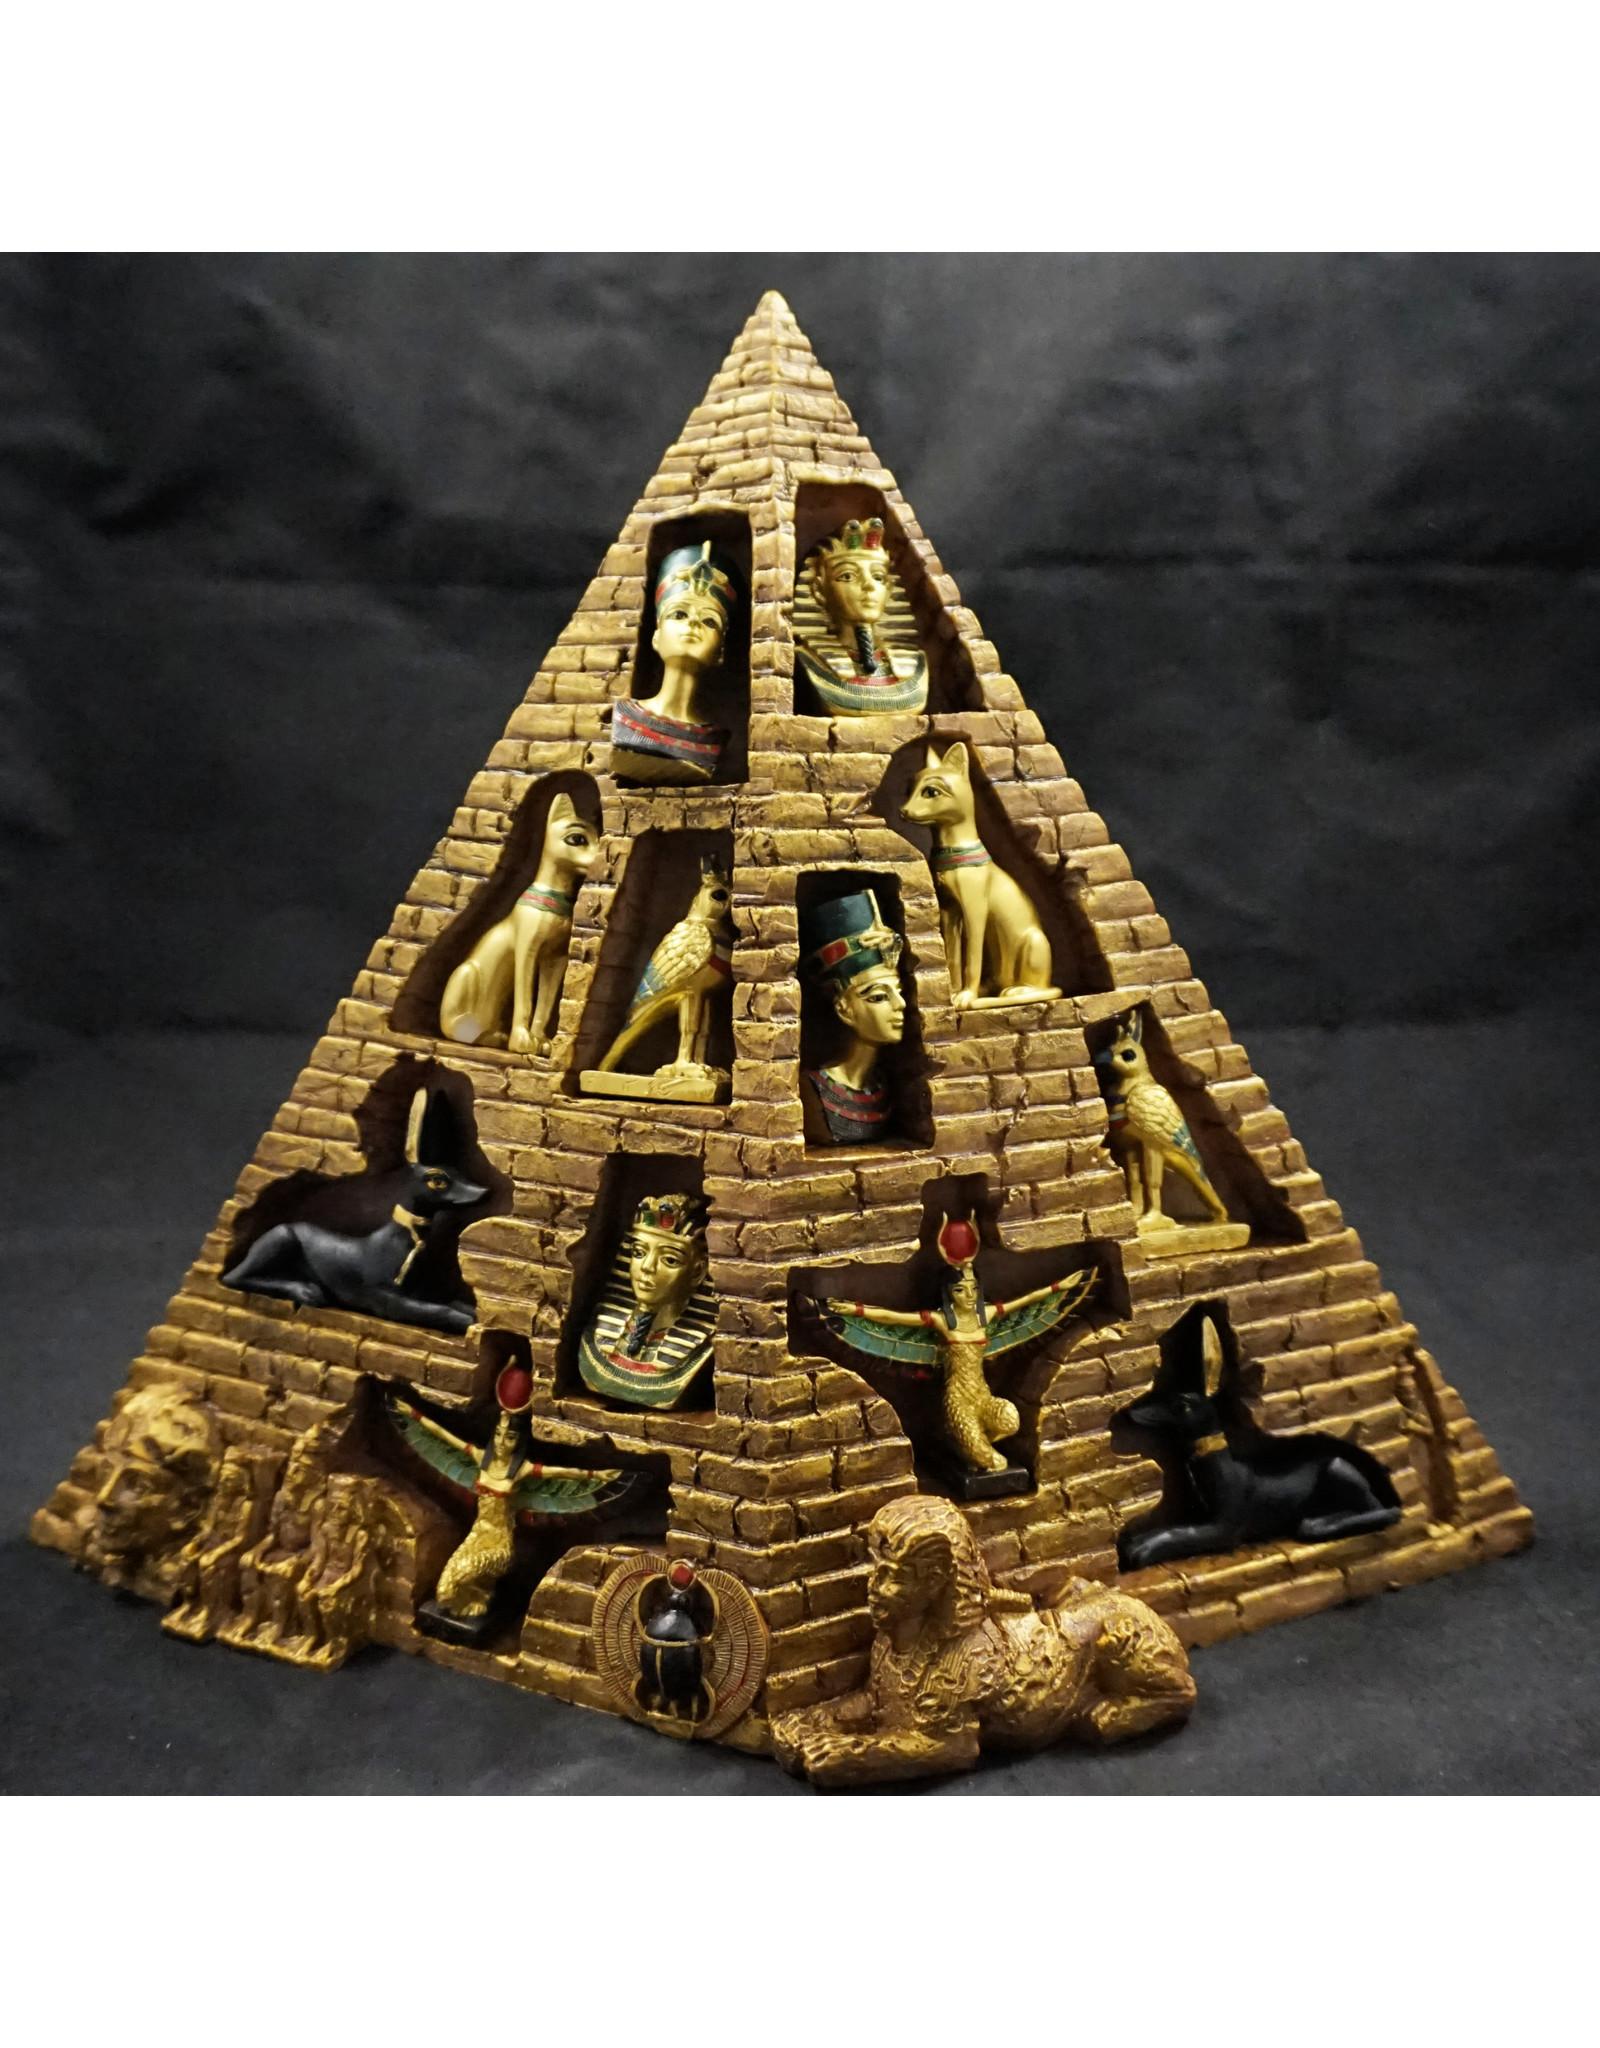 Egyptian Statue - Egyptian Set with Pyramid Display